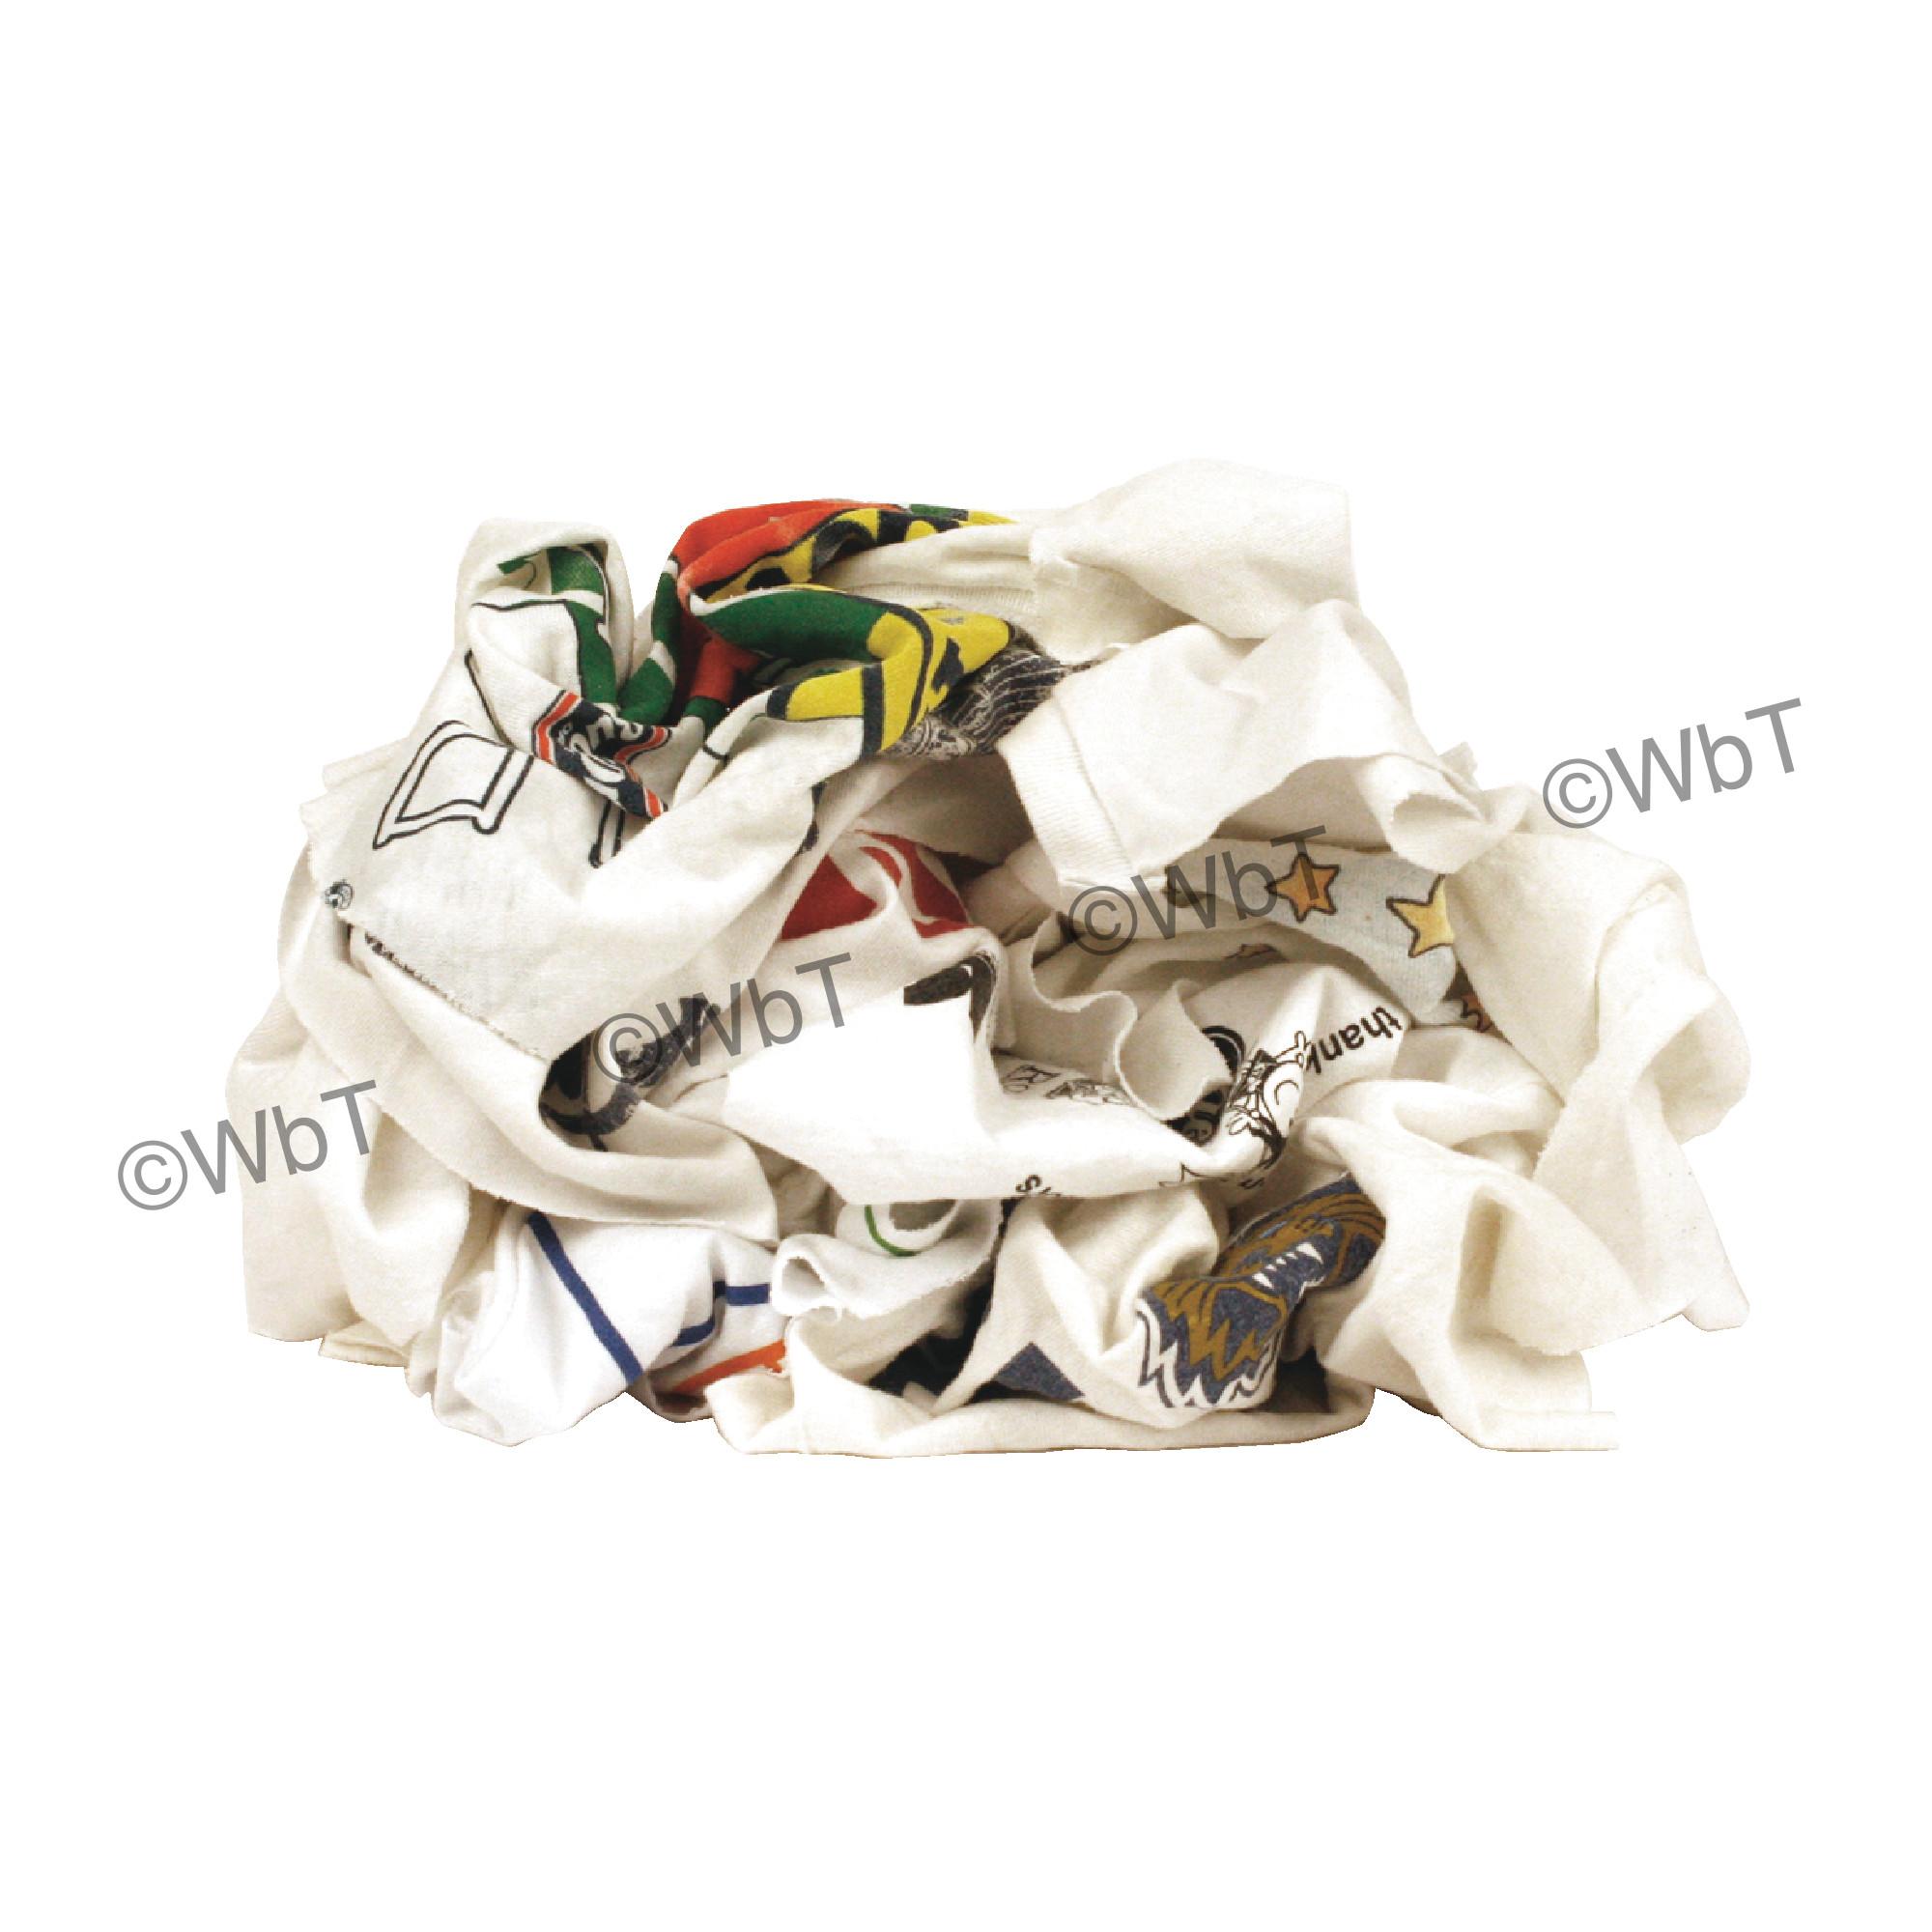 25 Lbs Reclaimed White T-Shirt Rags